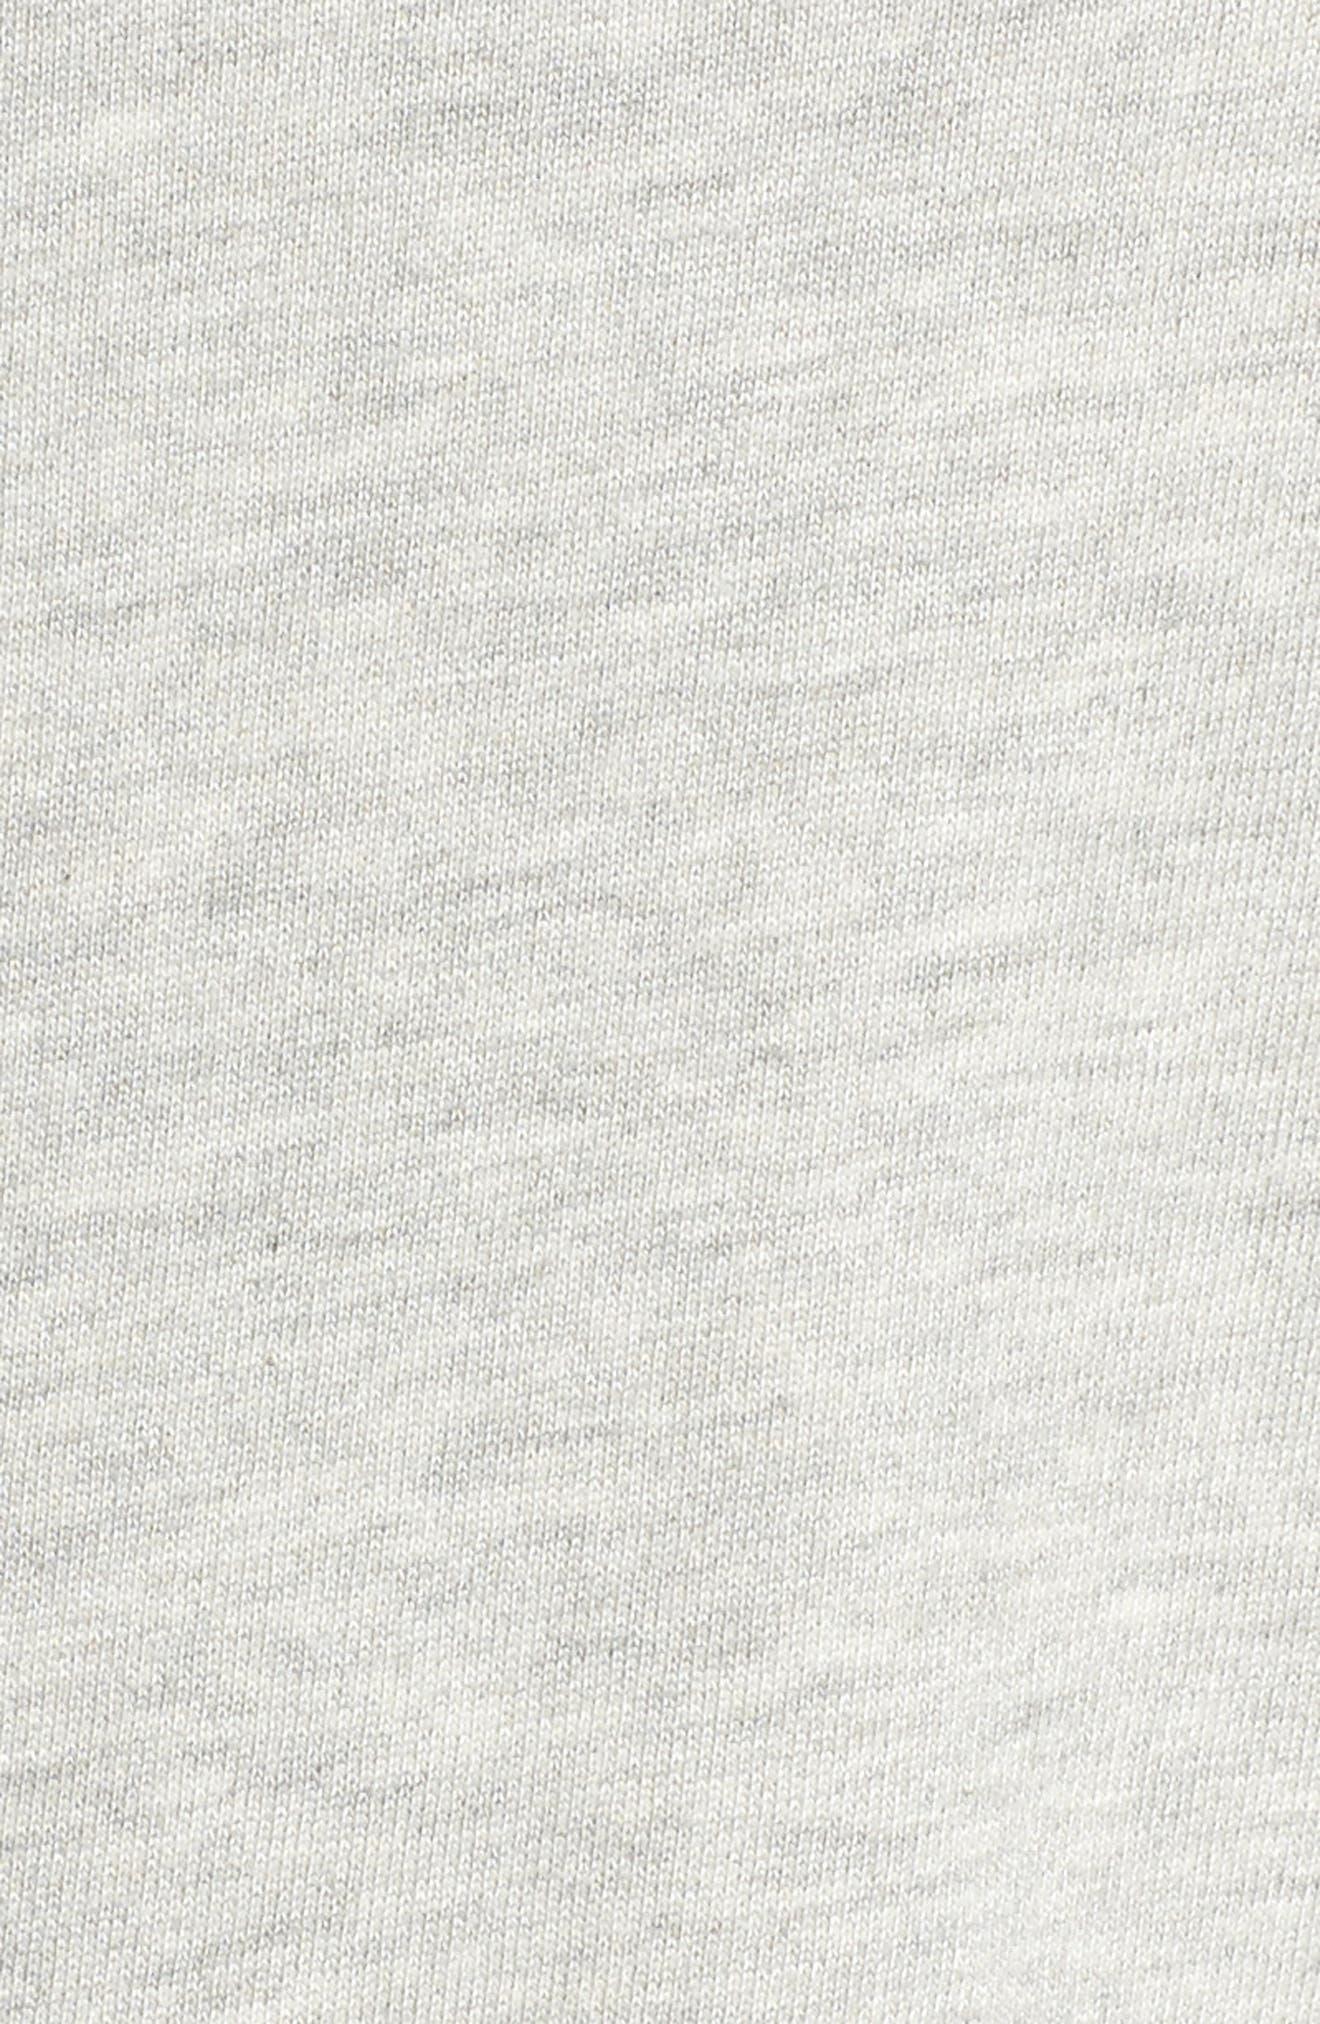 Ruffle Sweatshirt,                             Alternate thumbnail 5, color,                             HEATHER GREY